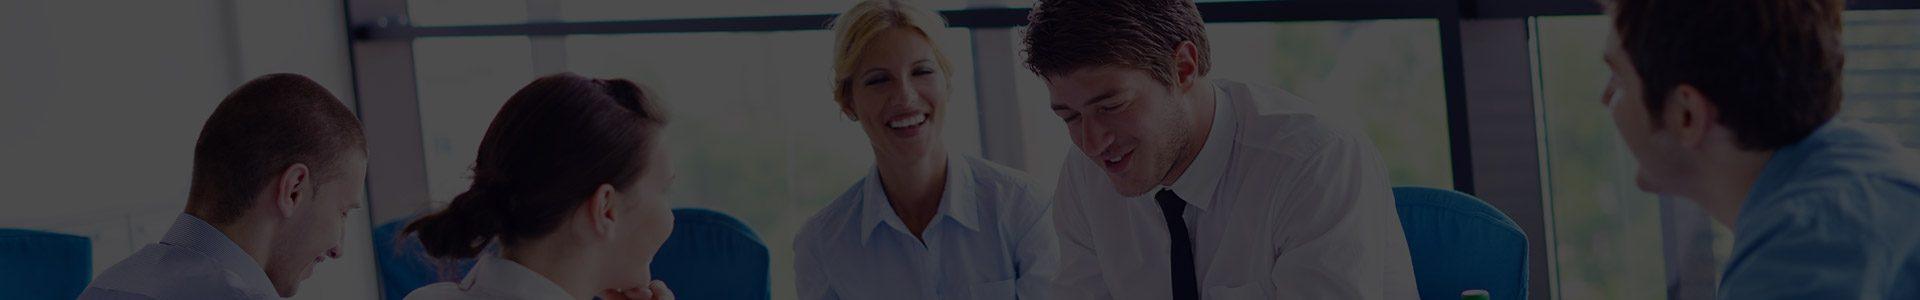 CCIS Employer Hub Updates